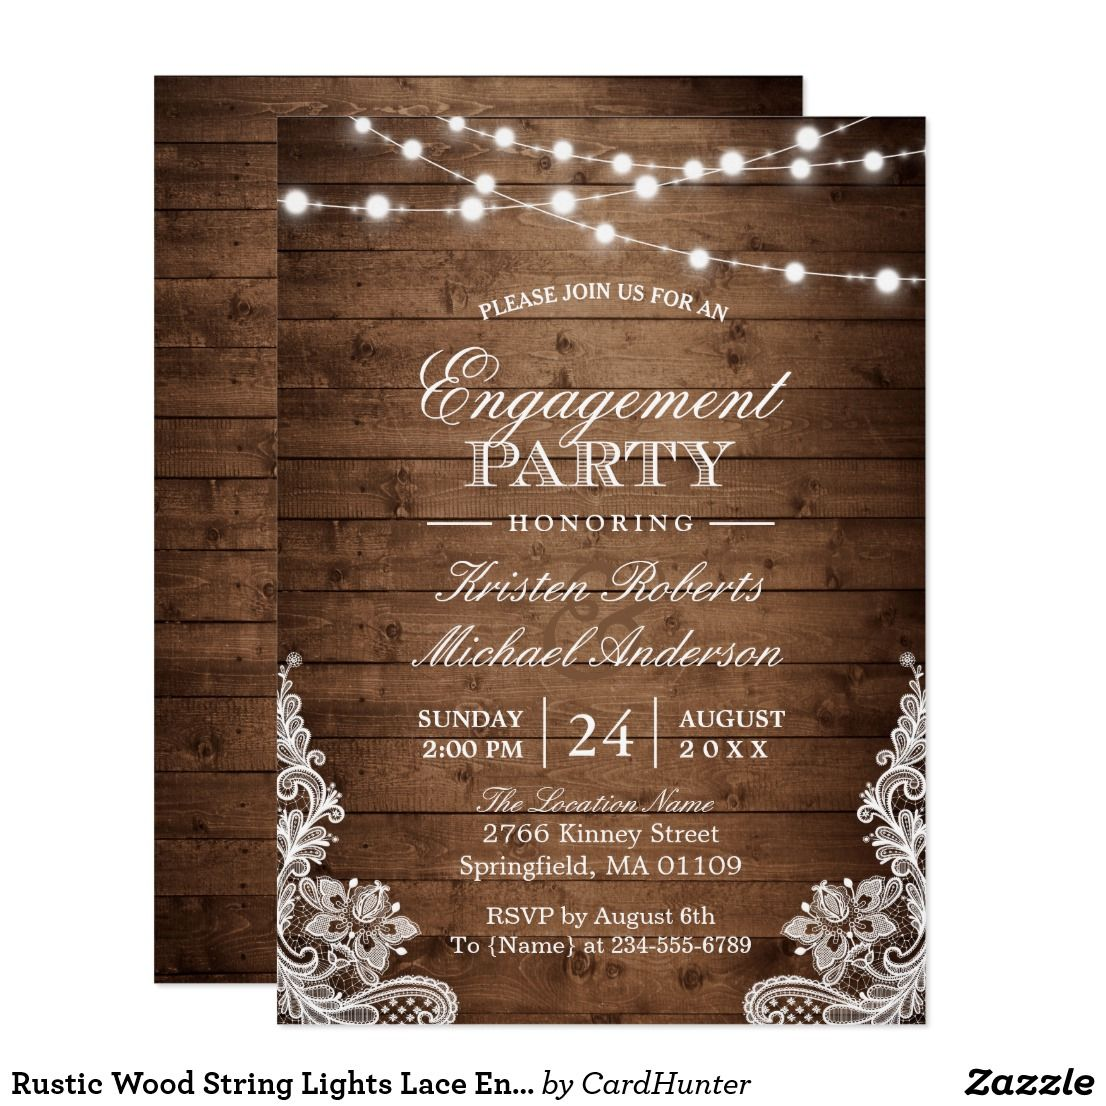 ENGAGEMENT INVITATION RUSTIC WOOD LIGHTS WEDDING INVITE PARTY INVITATIONS